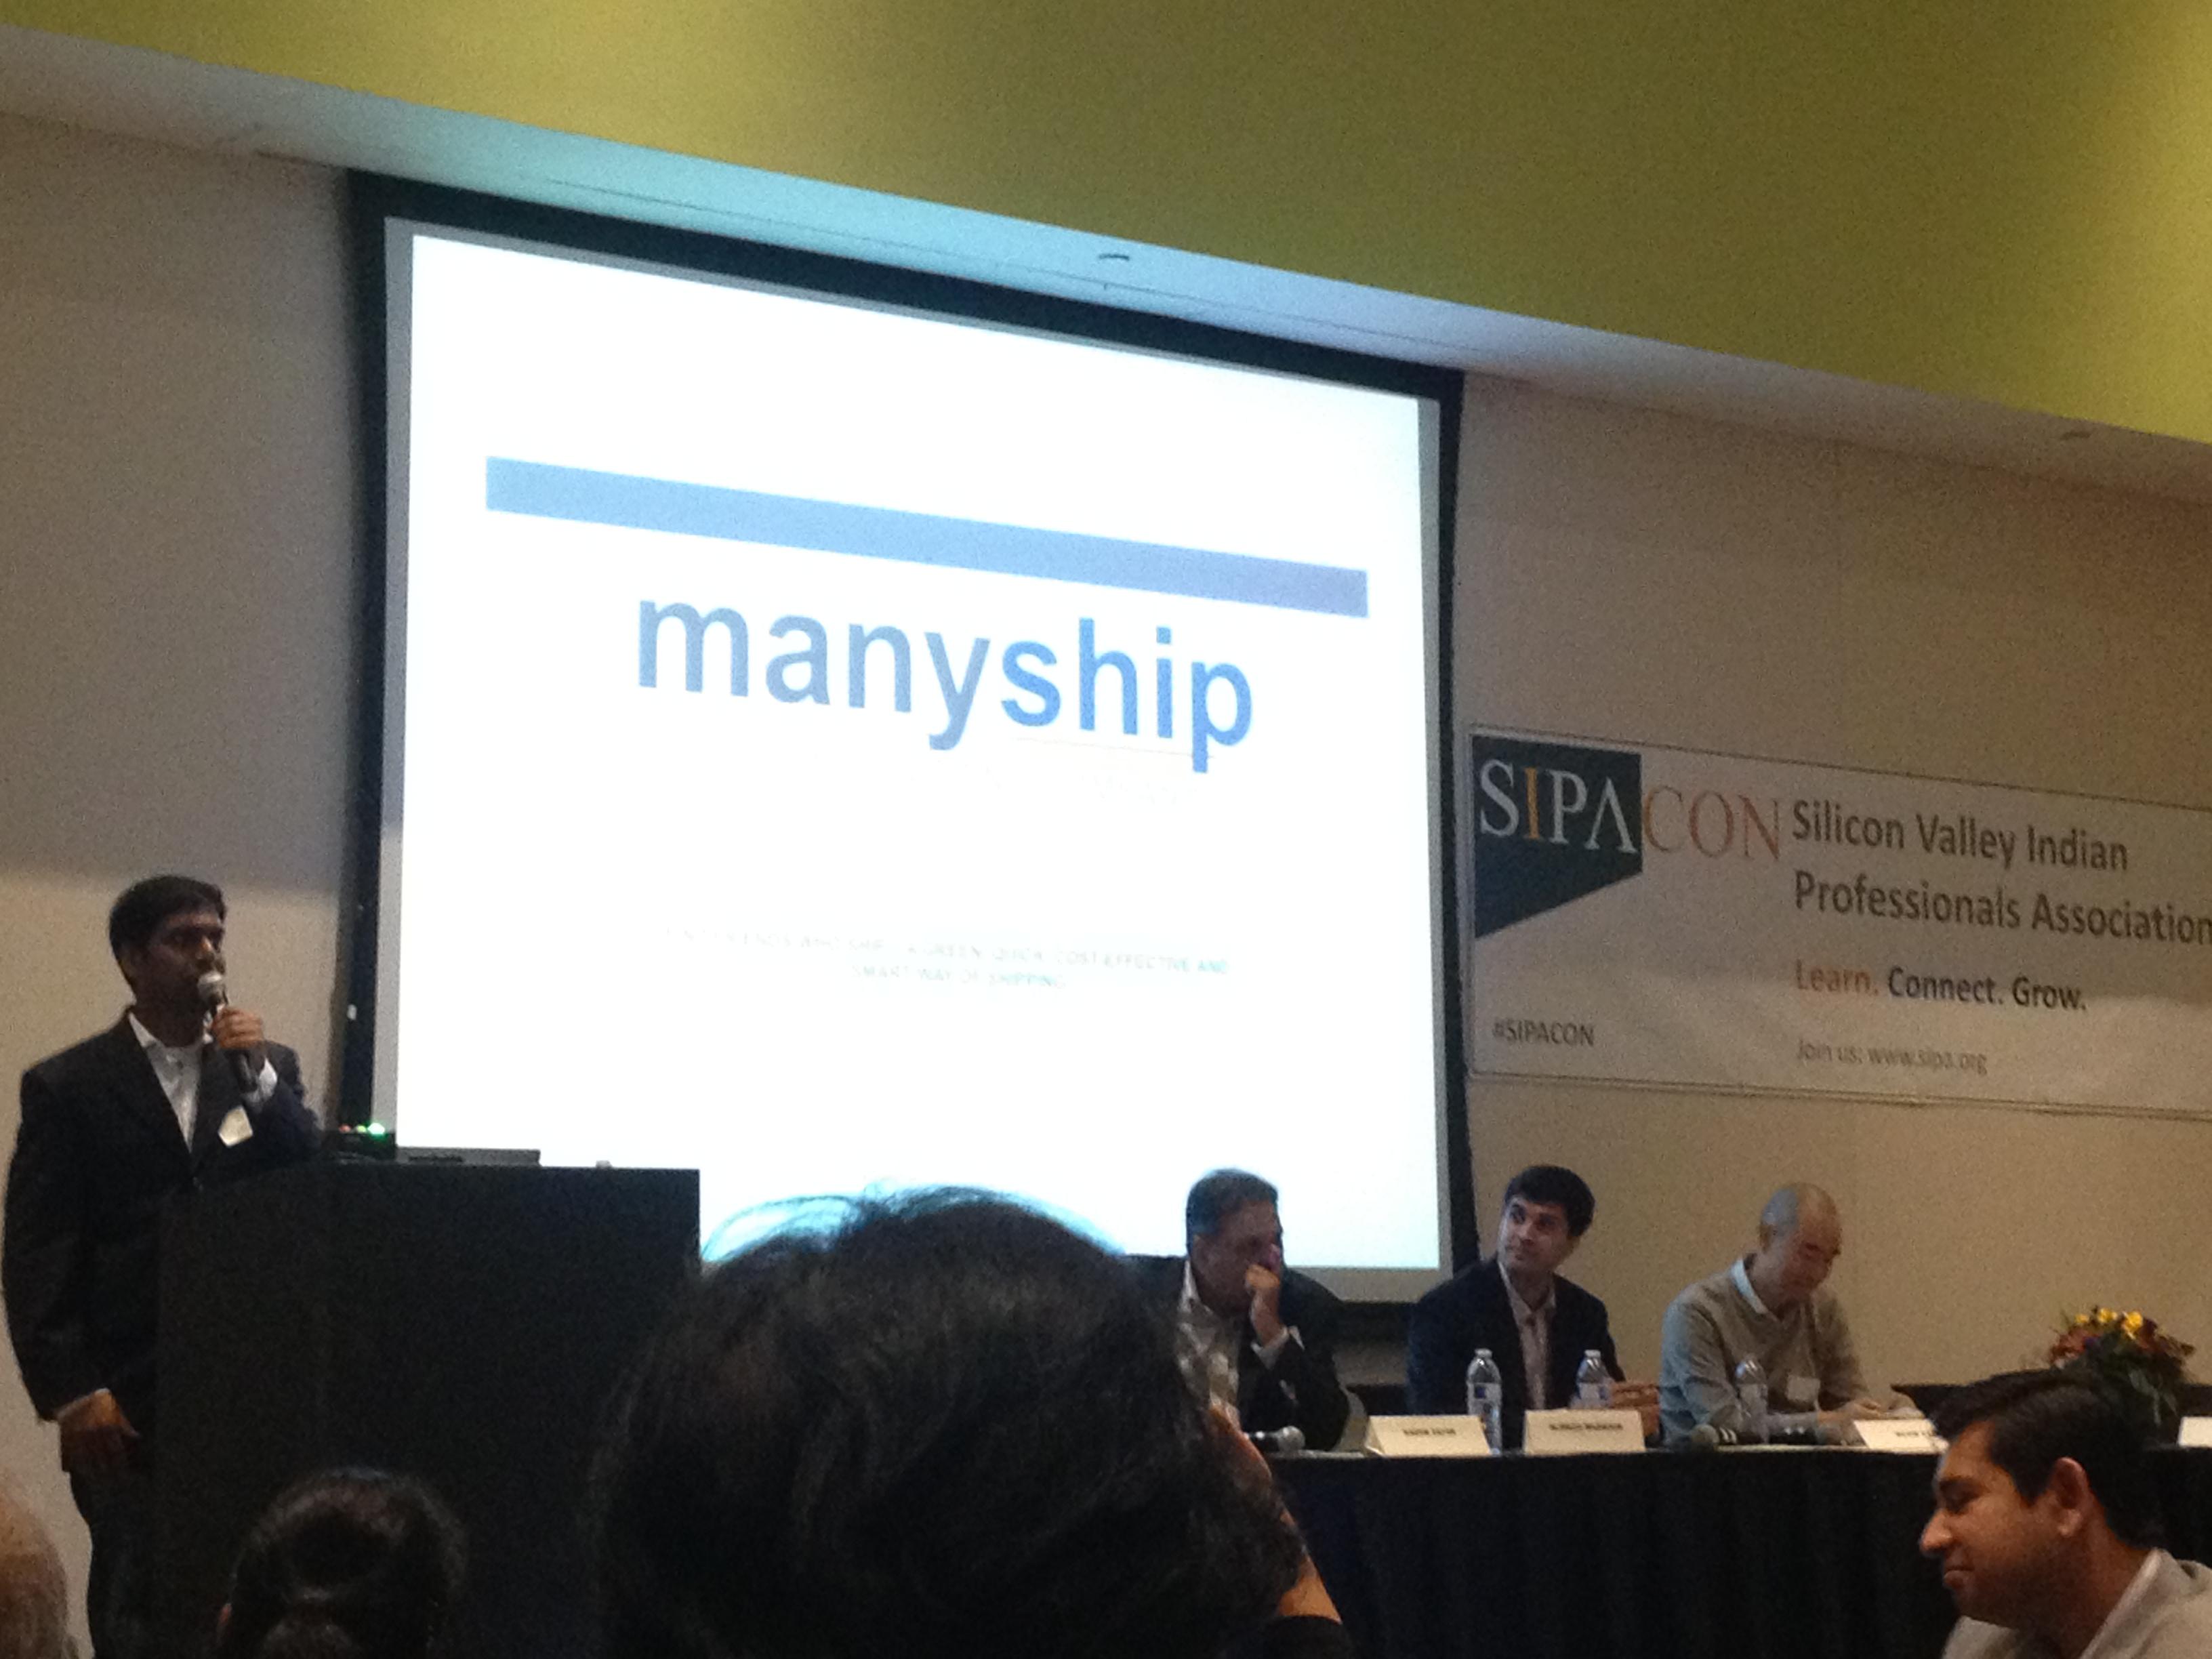 Prasad pitching ManyShip at conference